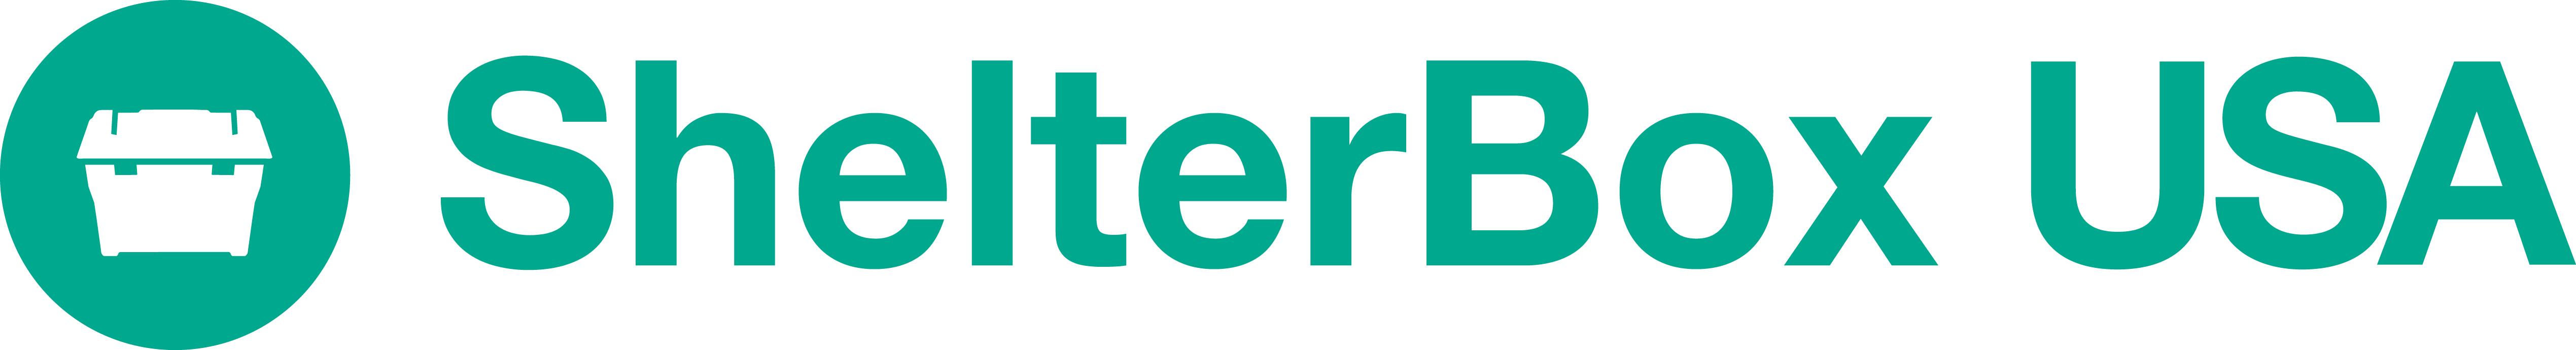 ShelterBox USA logo